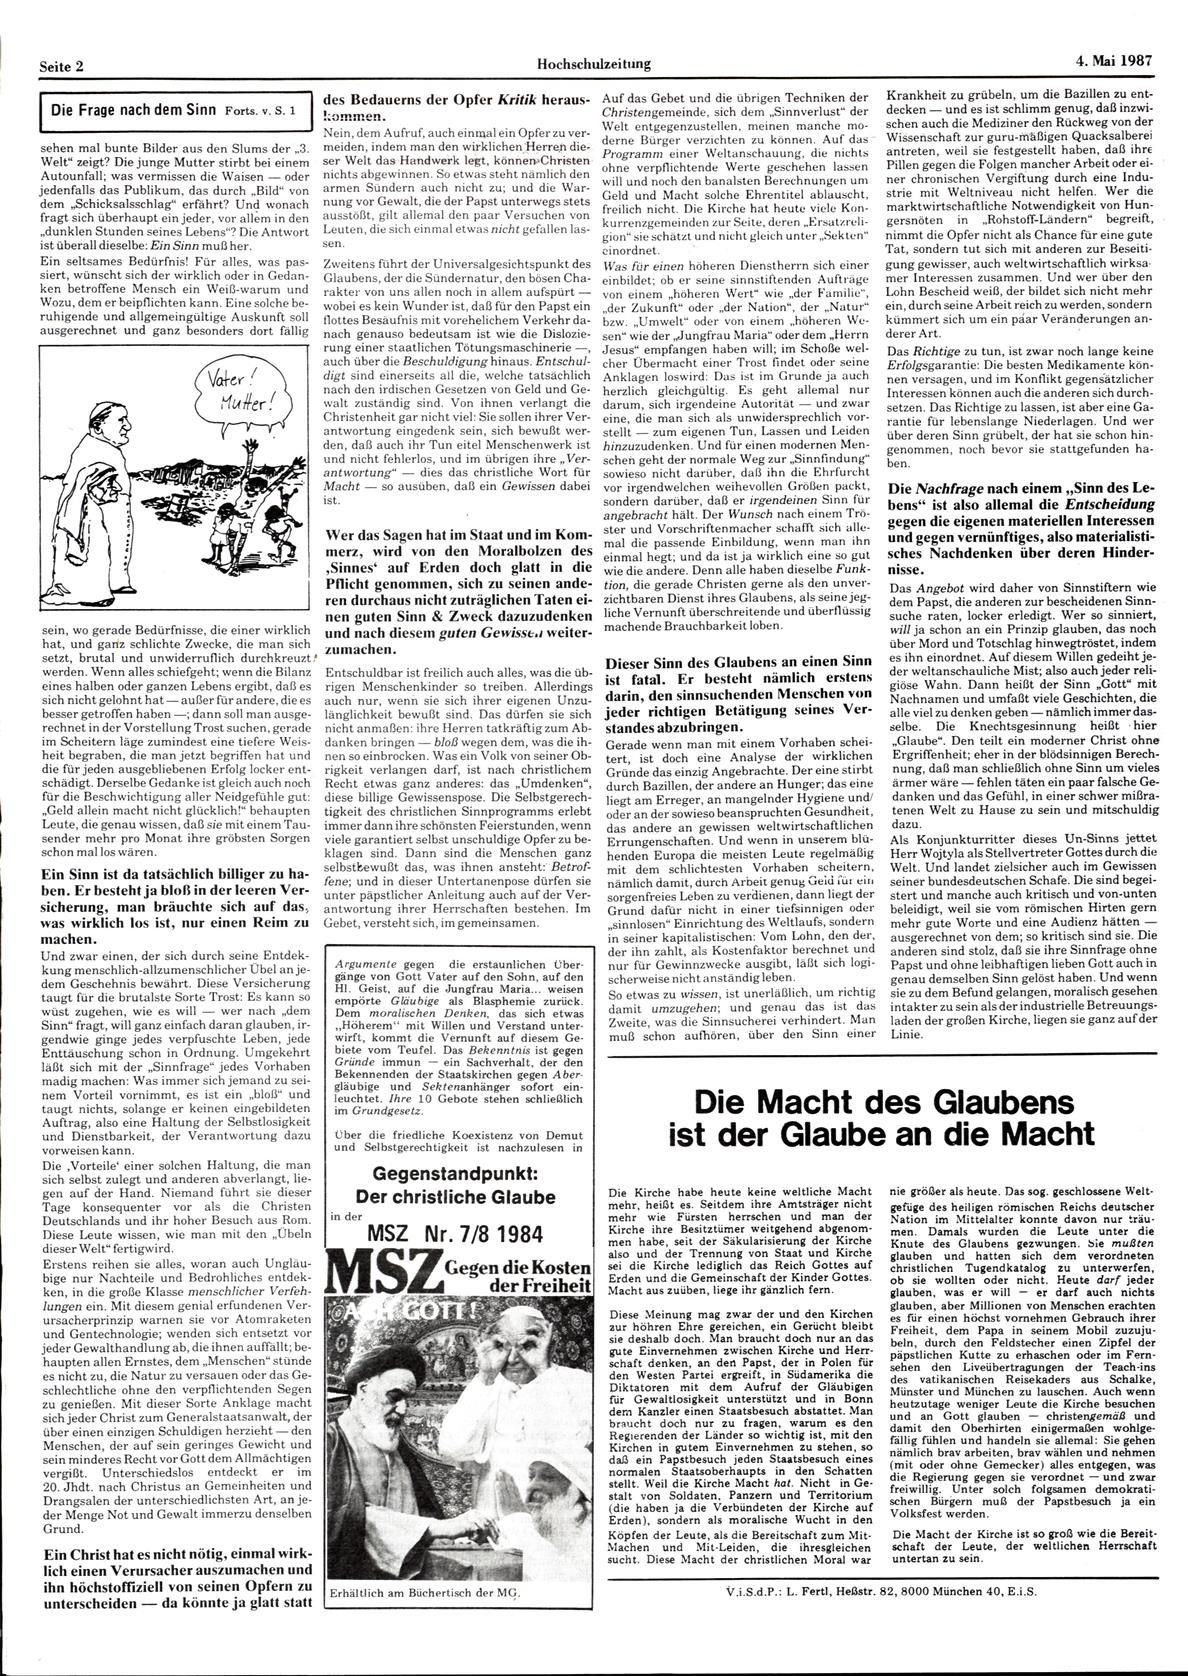 Bochum_BHZ_19870504_148_002